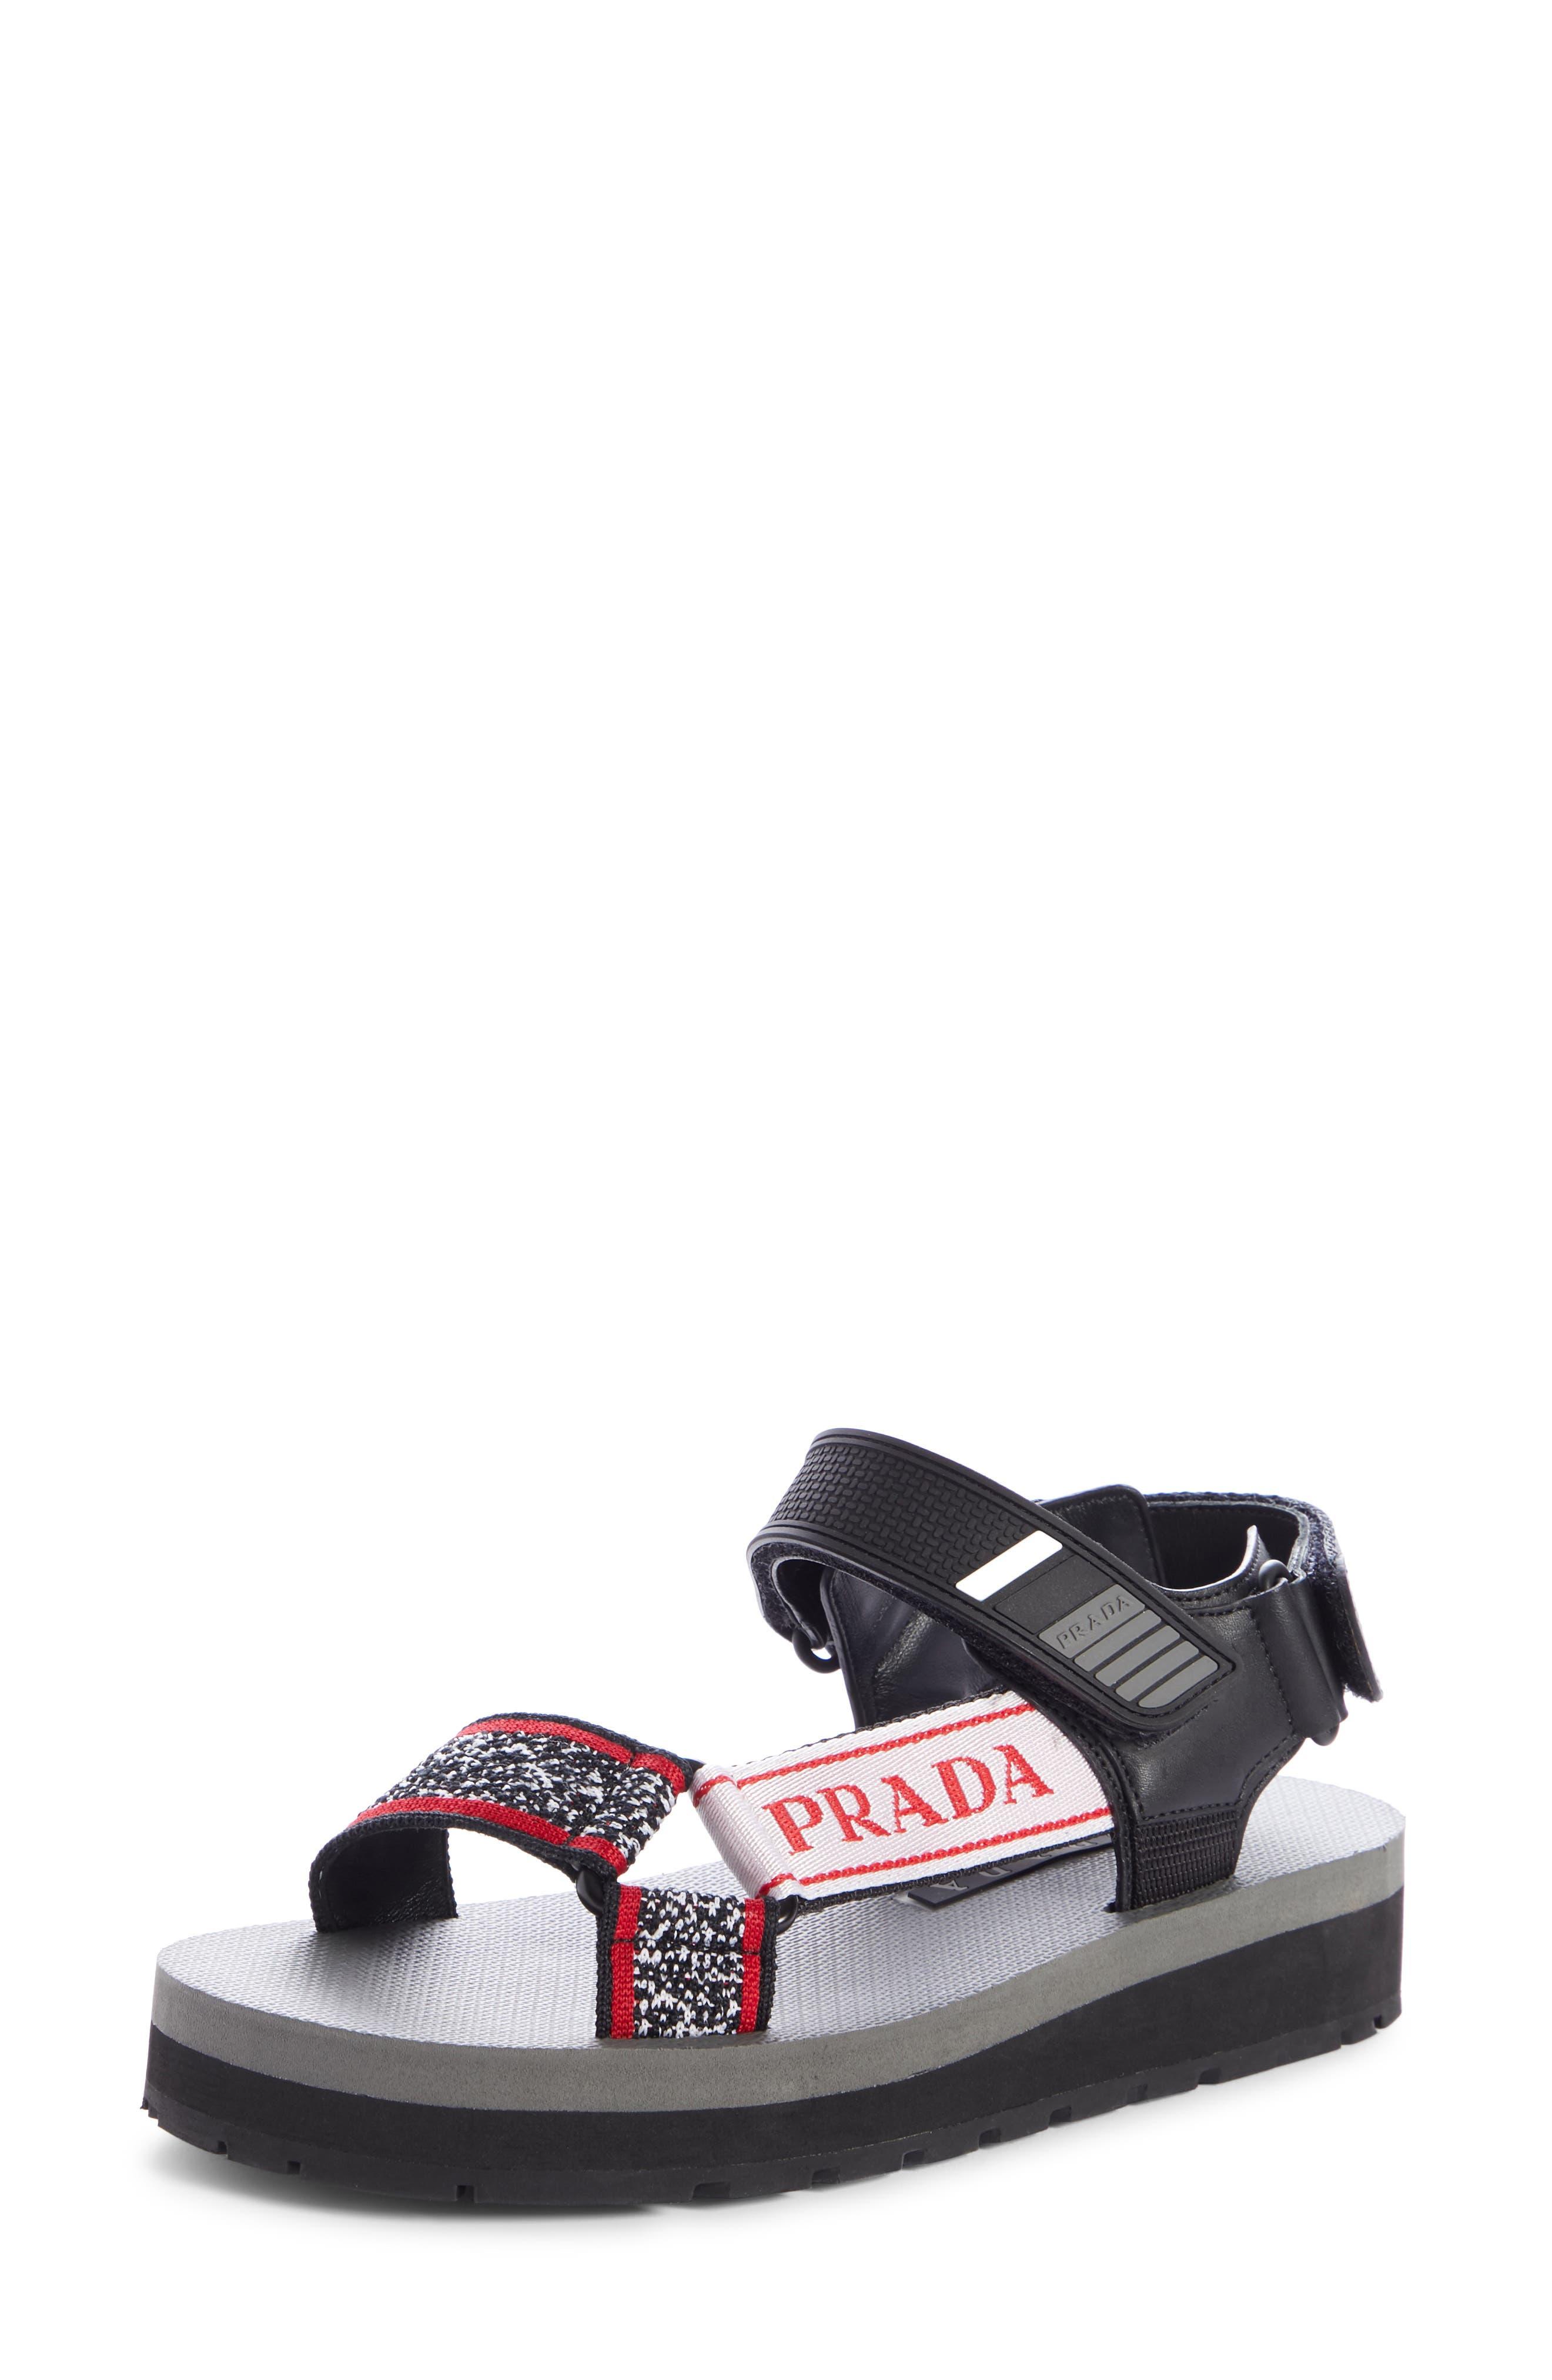 PRADA Sport Sandal, Main, color, BLACK/ RED